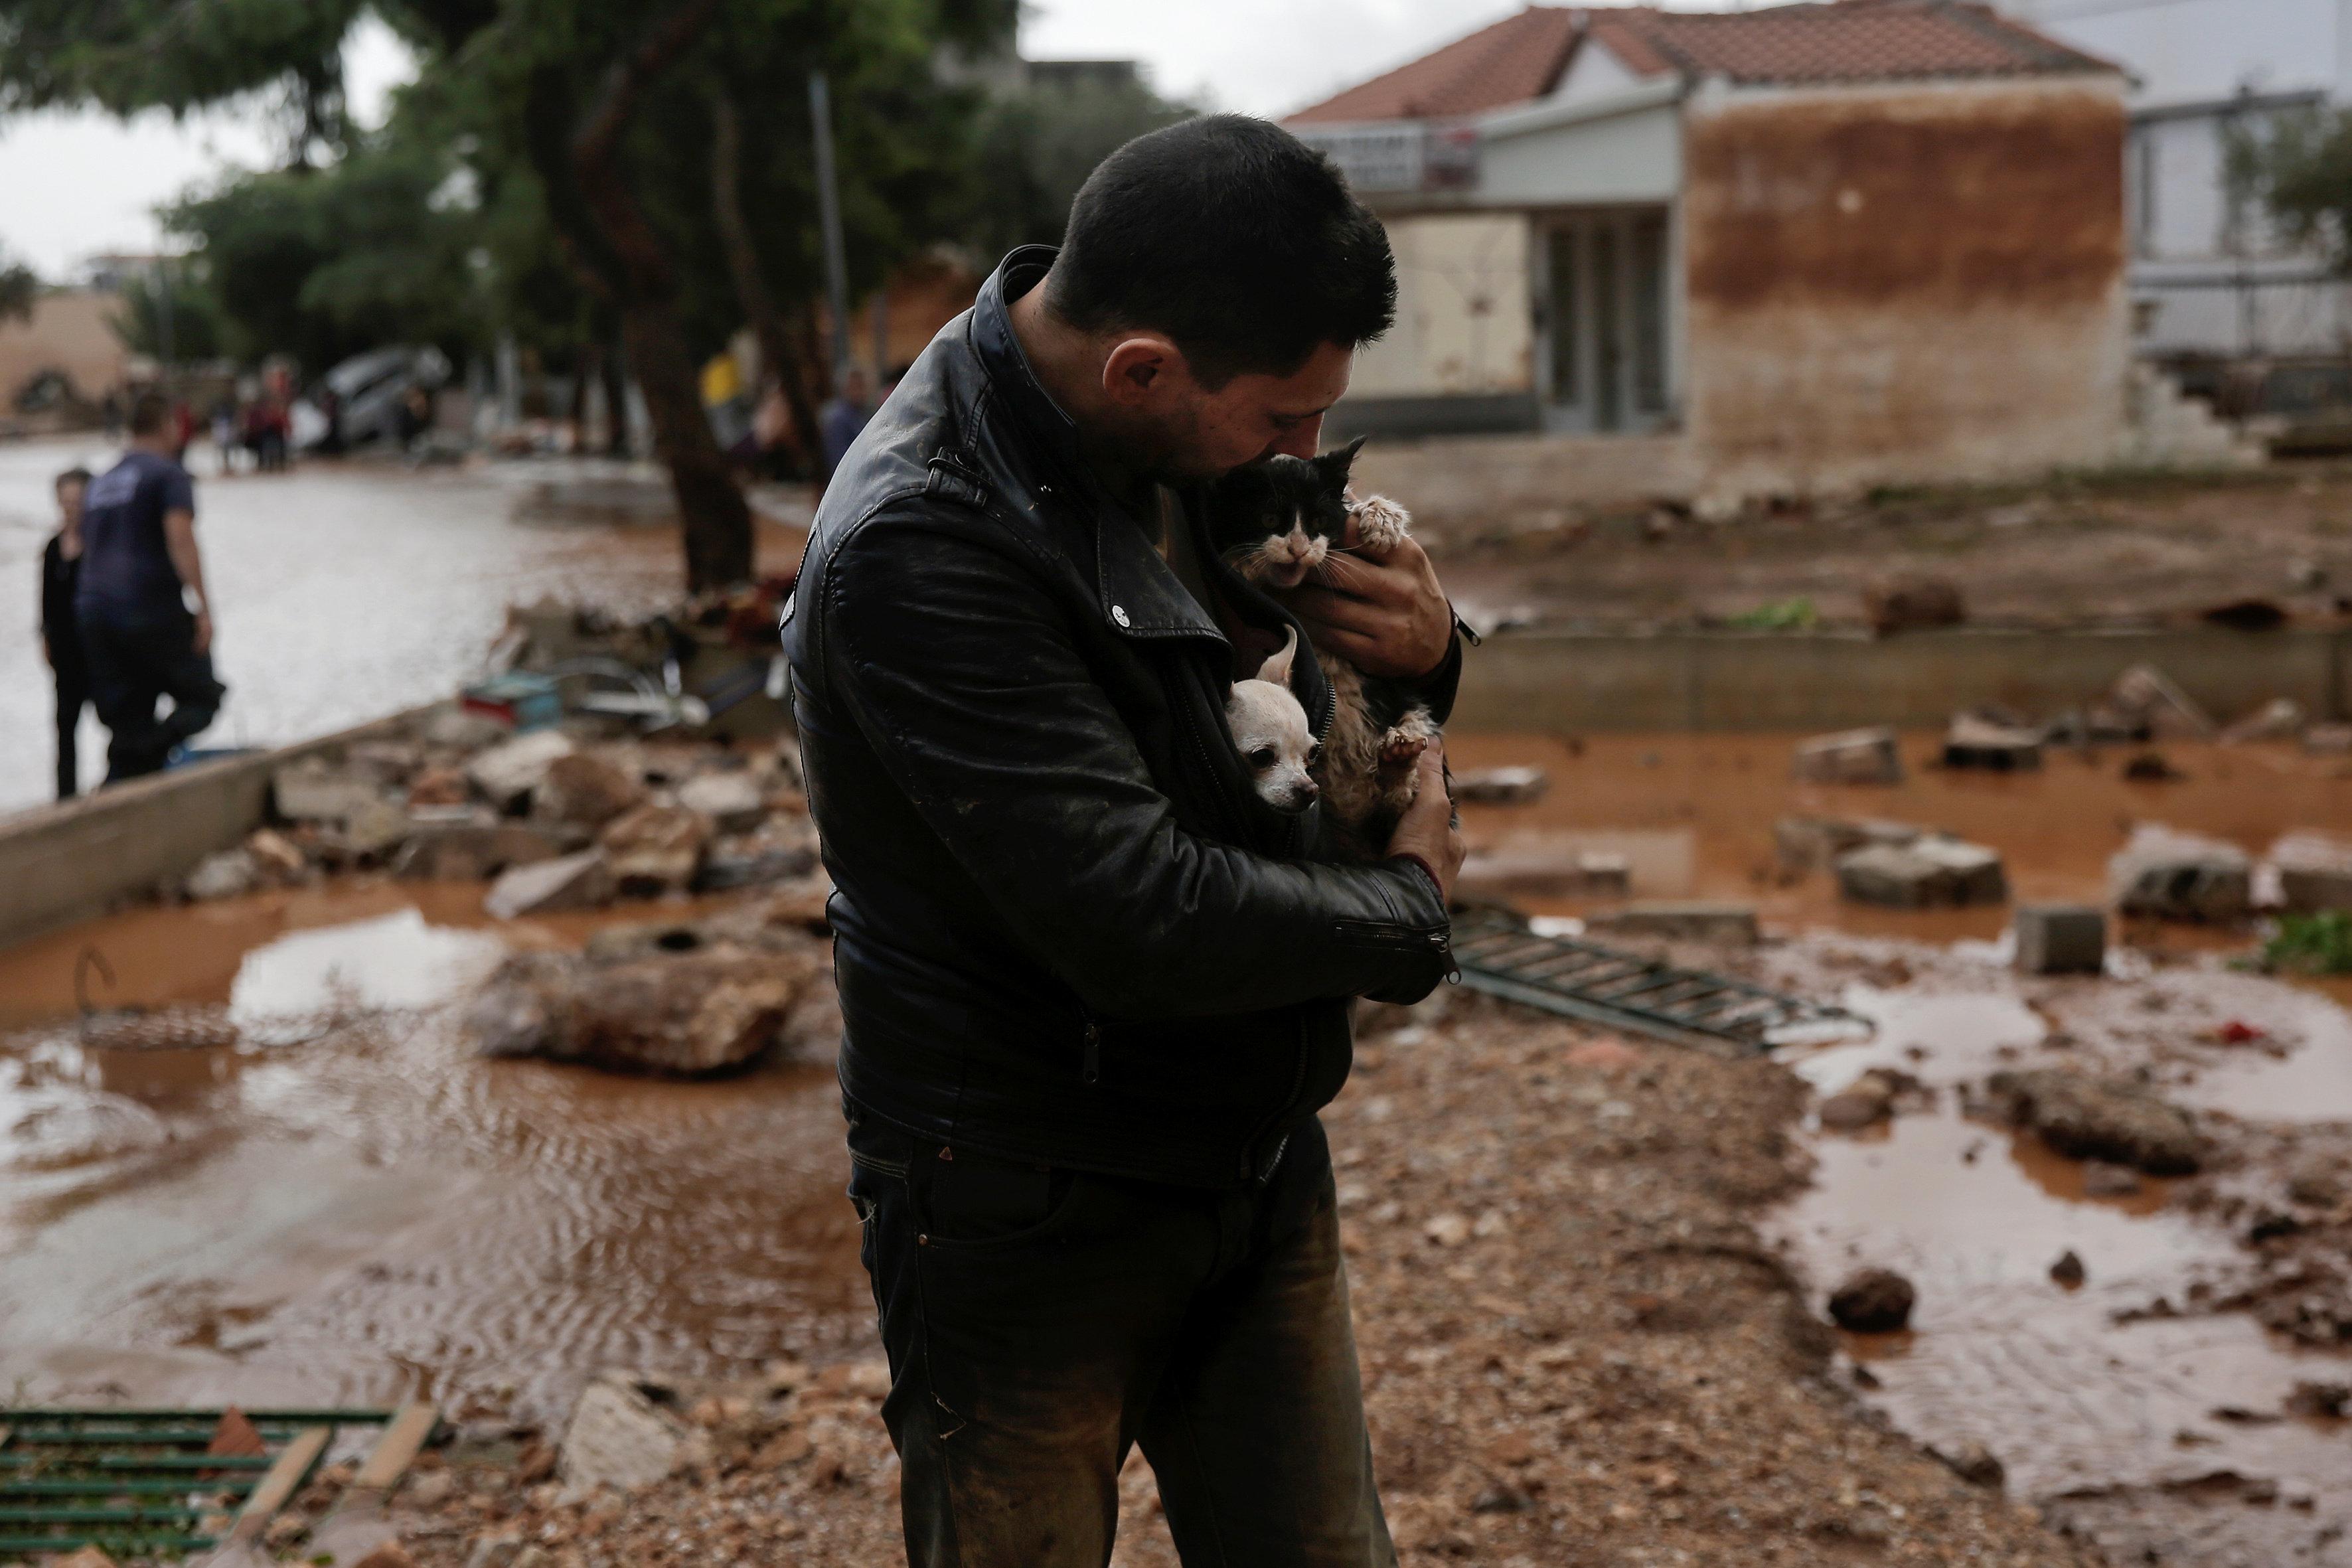 Photos Show 'Biblical' Flooding In Greece Following Severe Storm